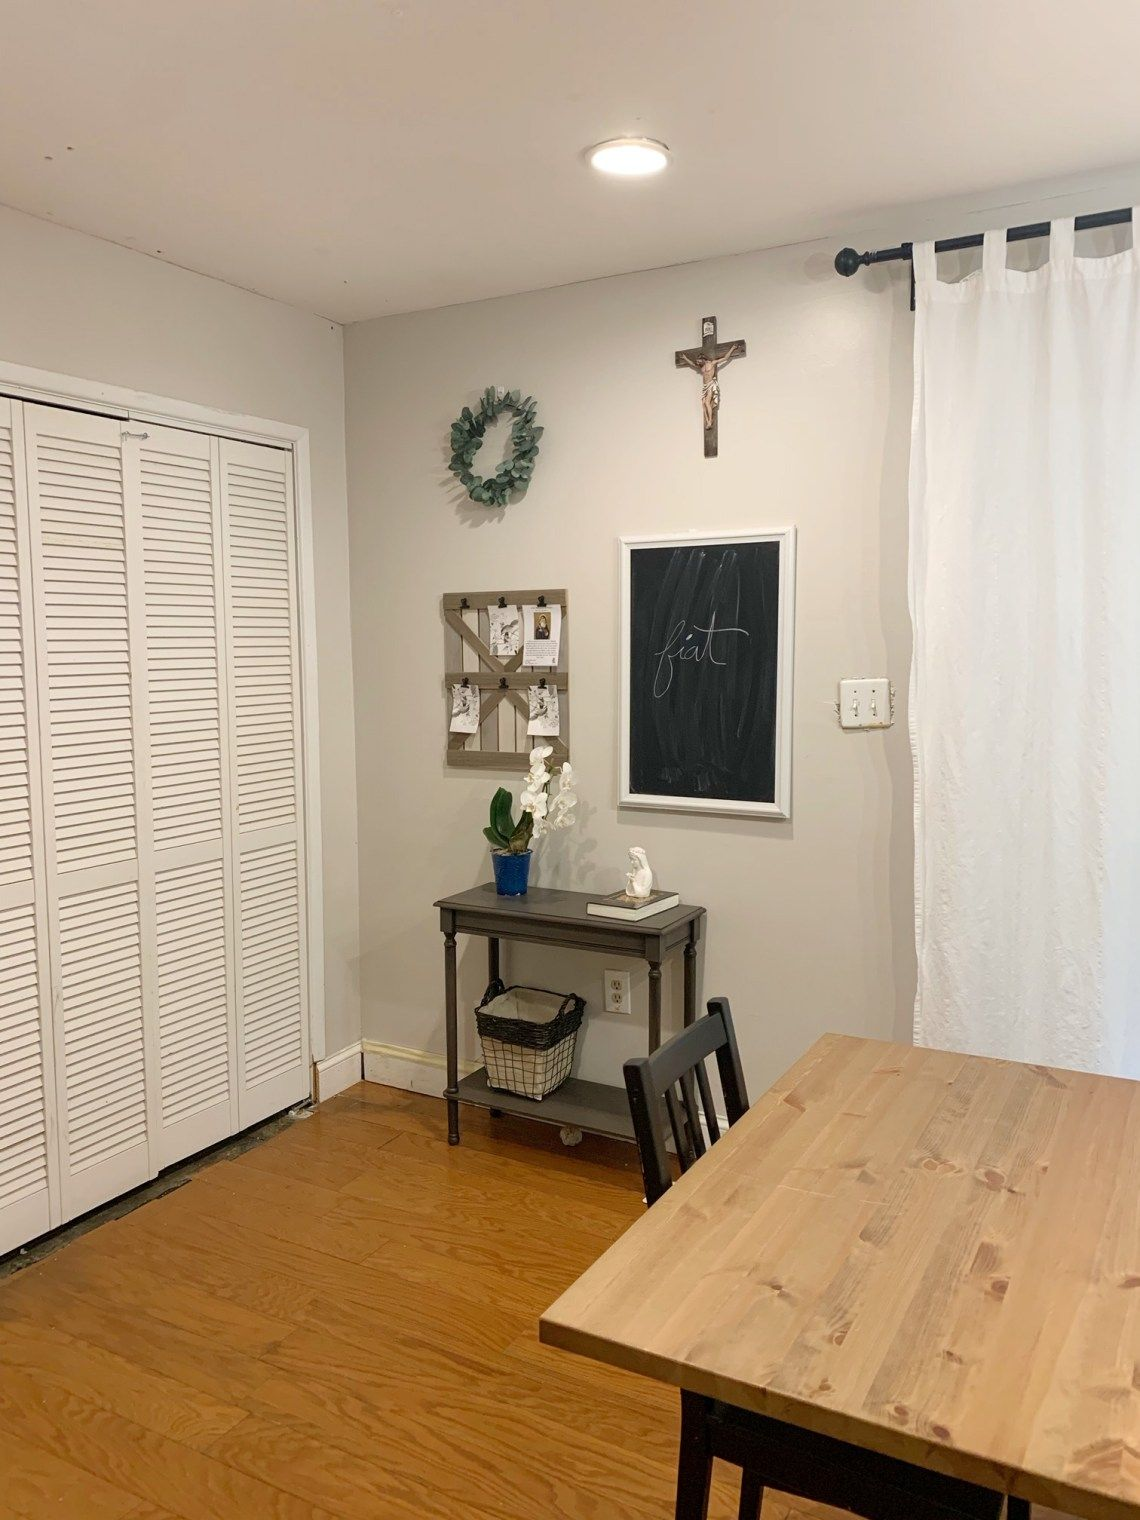 Pin On Home Decor Catholic home decor dining room